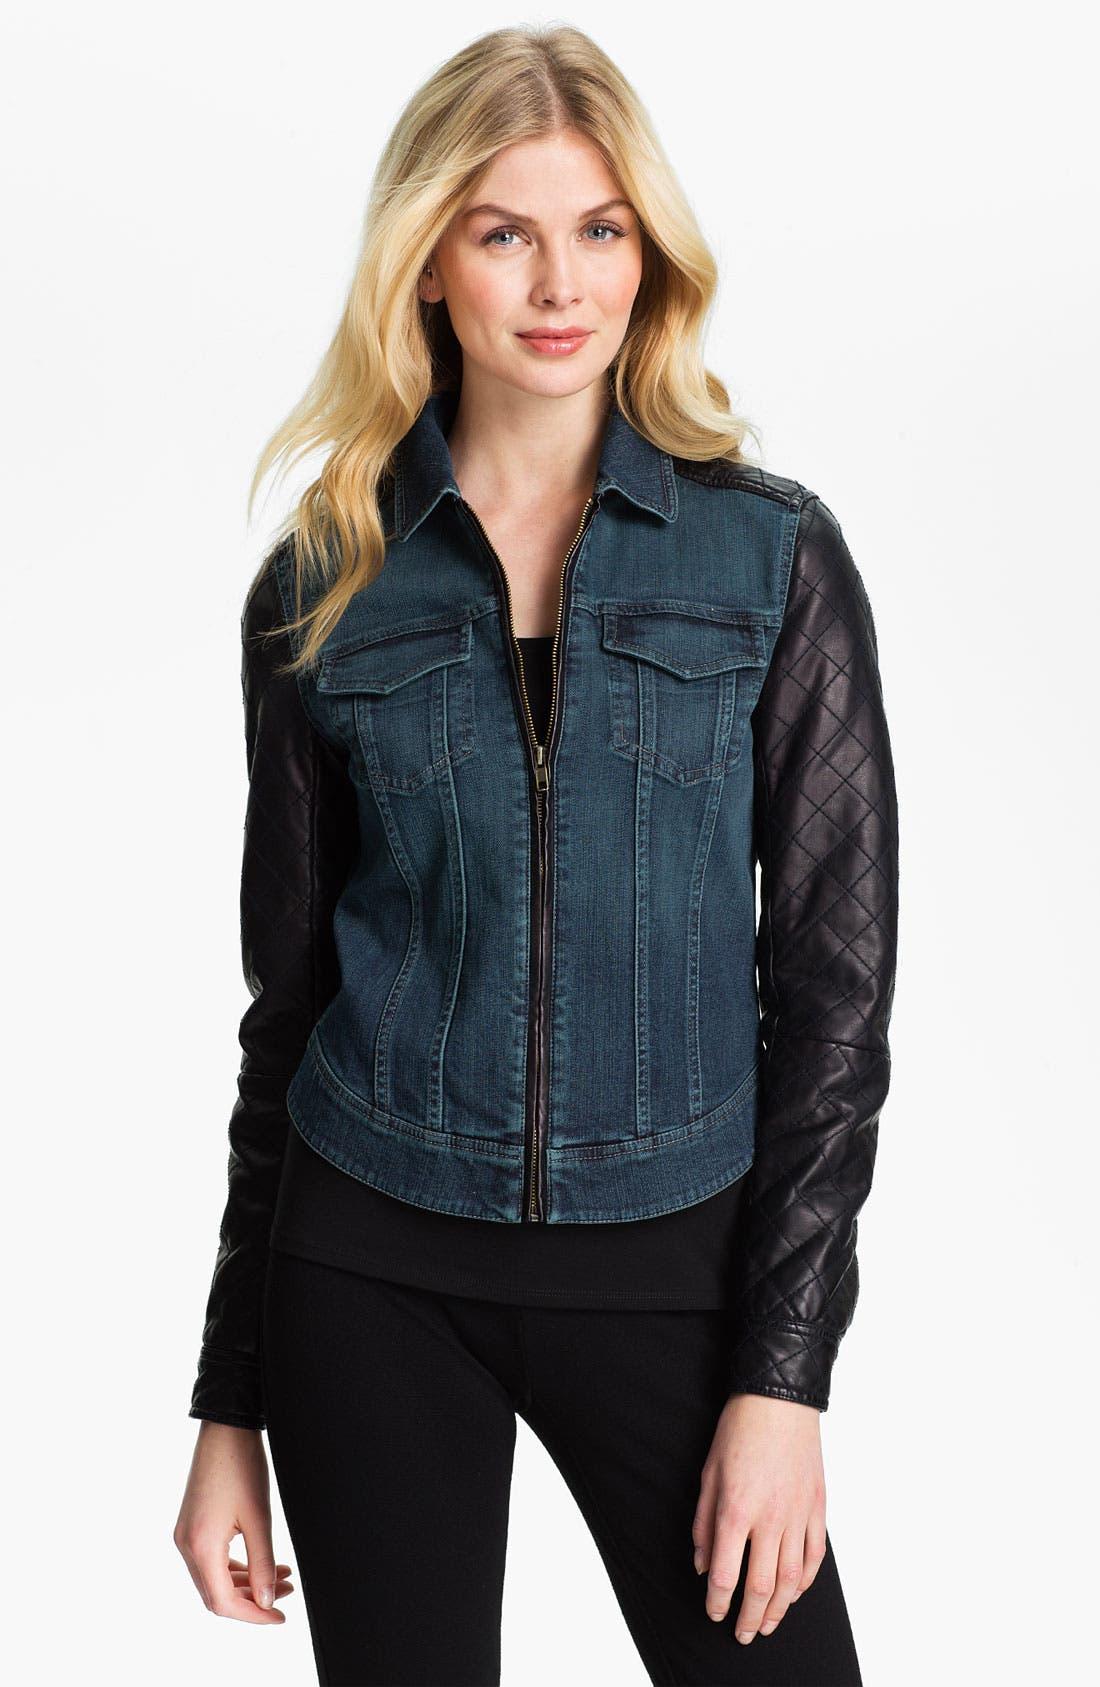 Alternate Image 1 Selected - Isaac Mizrahi Jeans 'Kimberly' Mix Media Jacket (Online Exclusive)